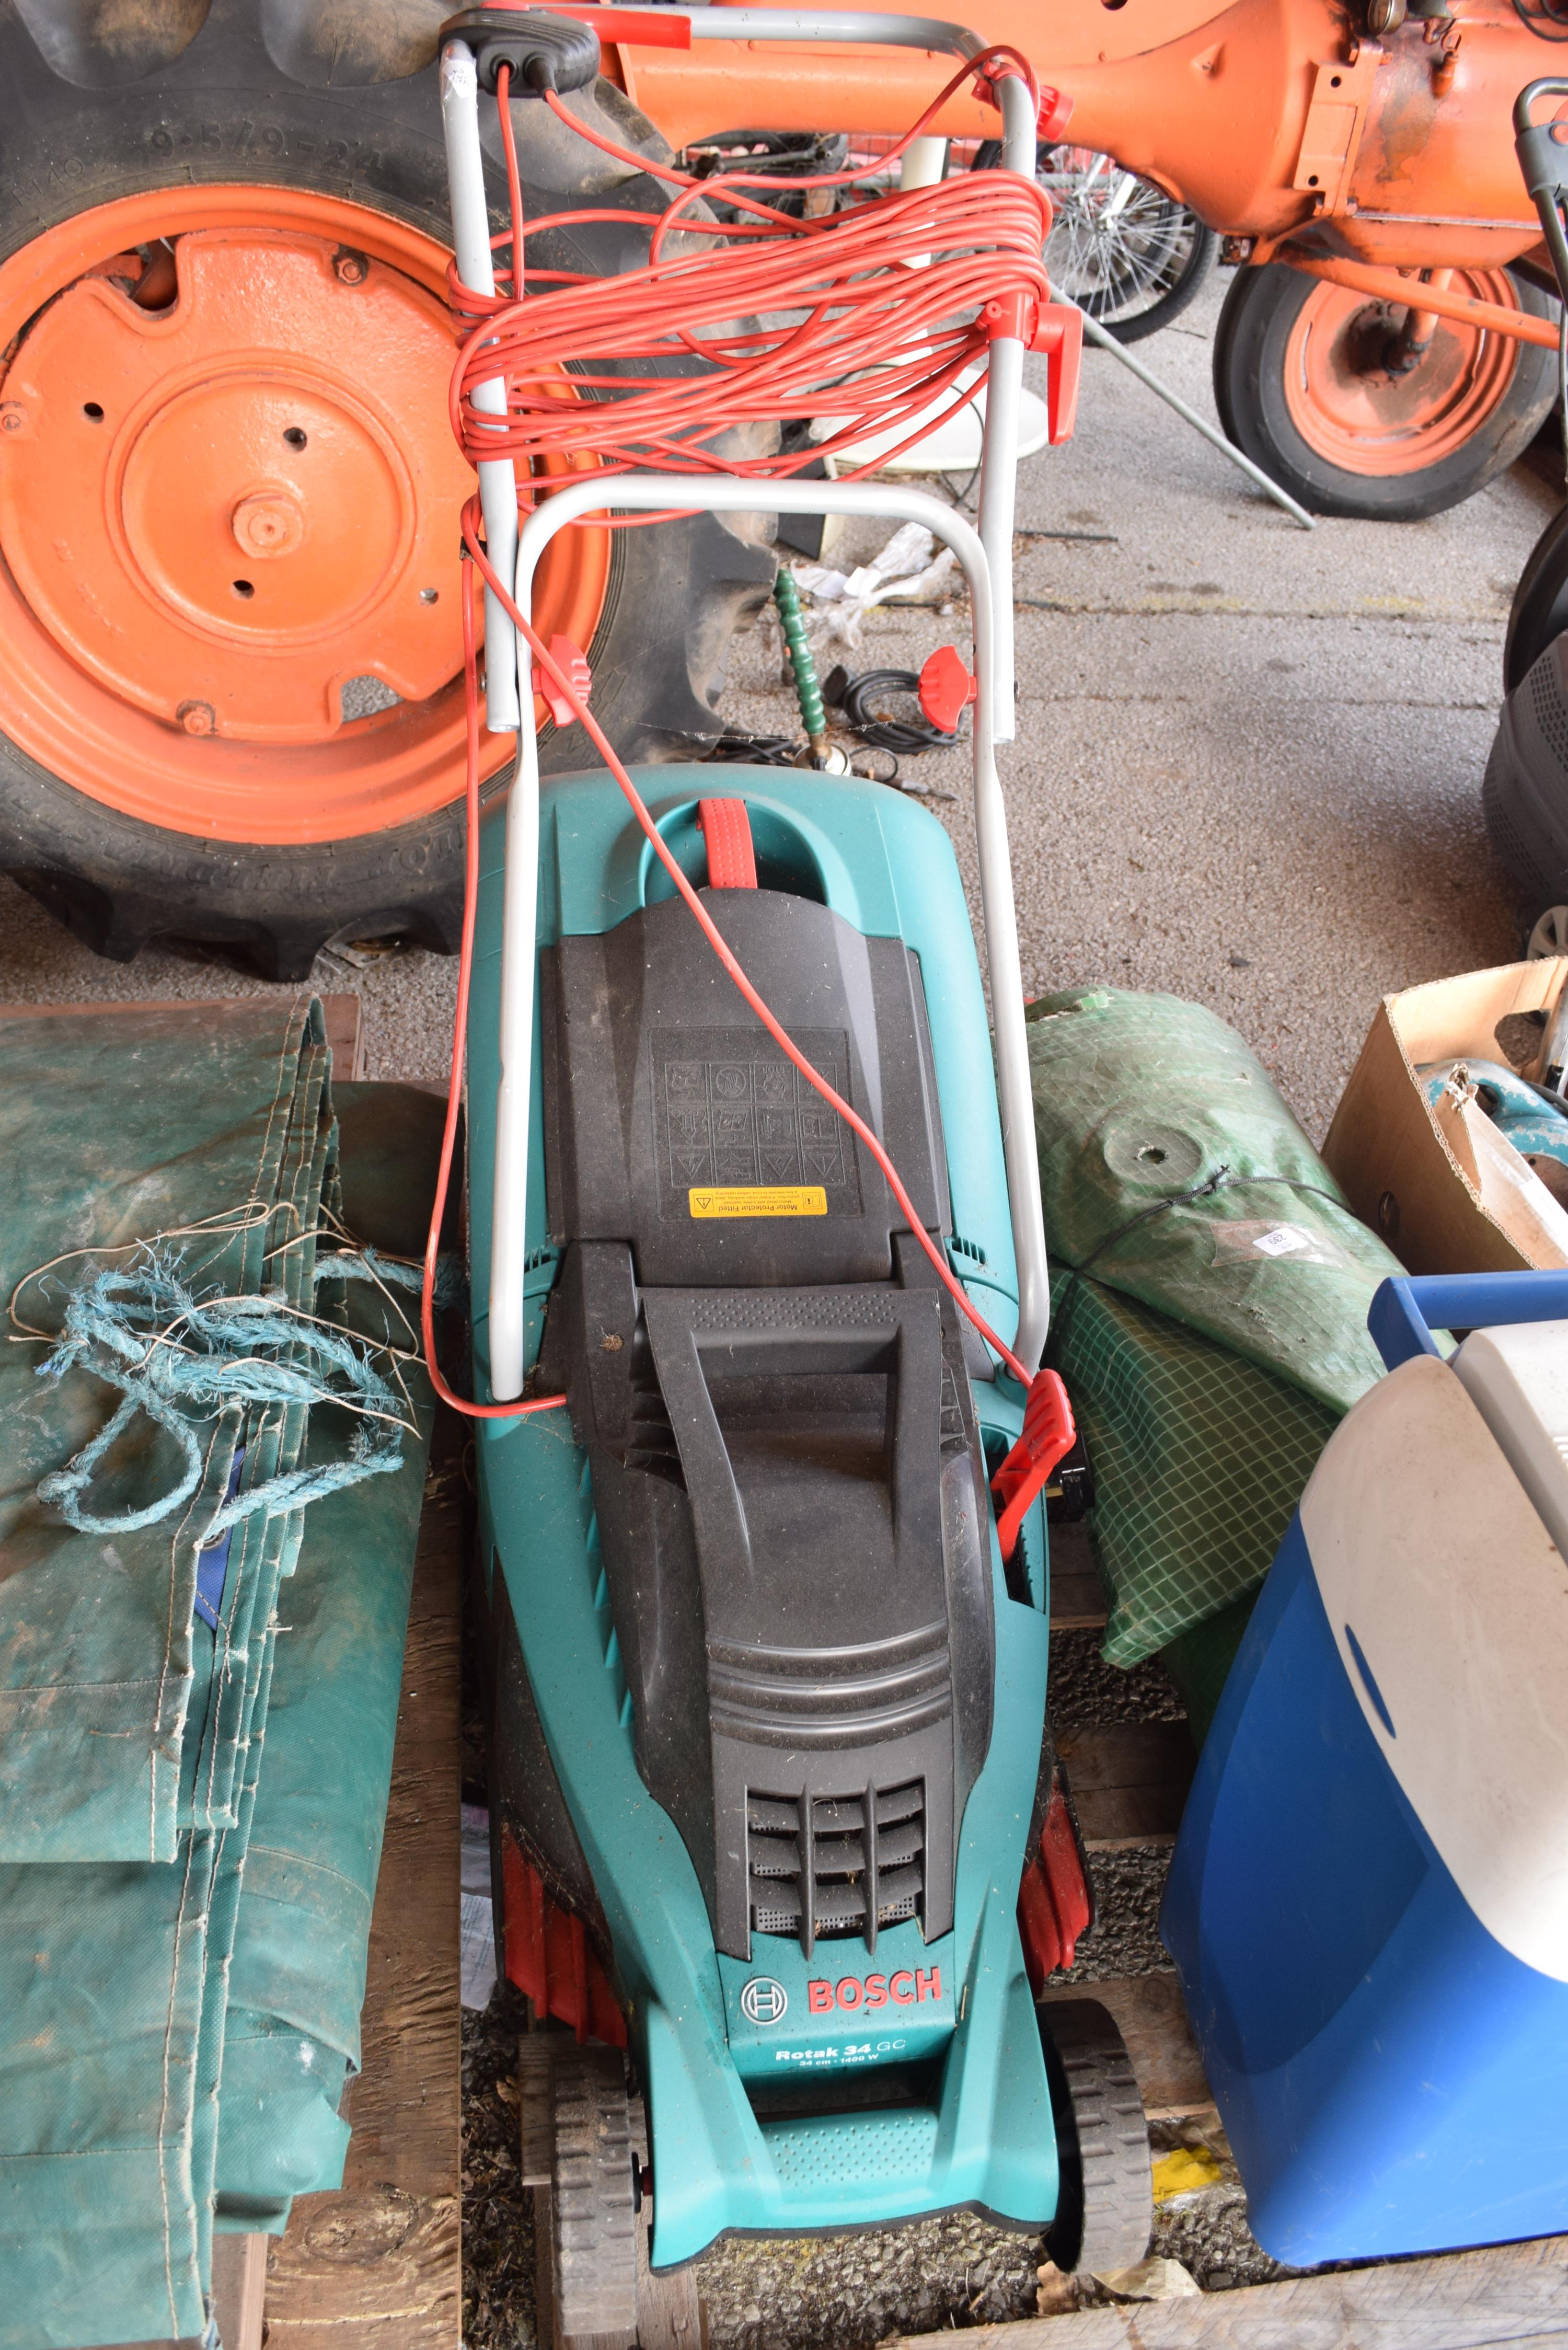 BOSCH ROTAC 34 ELECTRIC LAWNMOWER